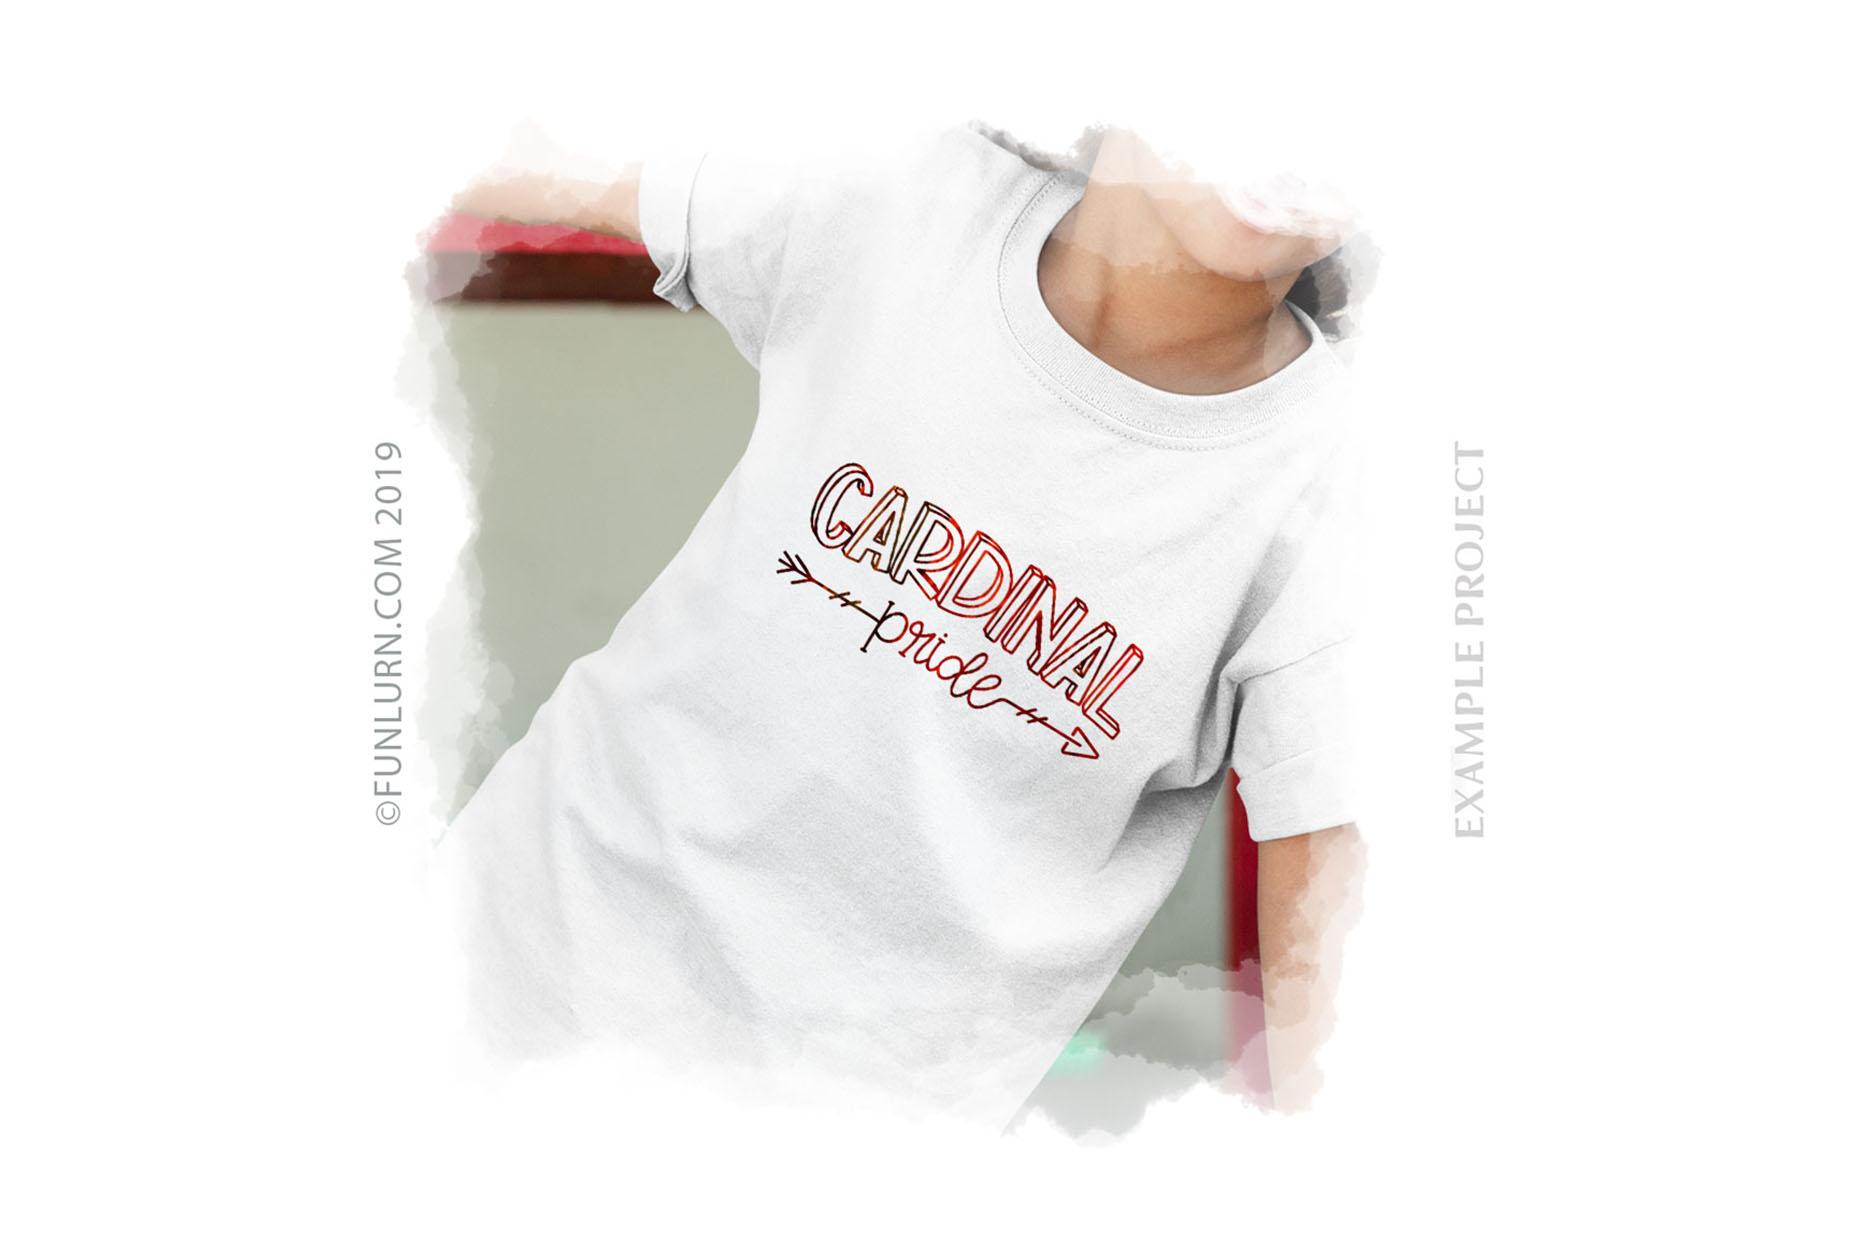 Cardinal Pride Team SVG Cut File example image 3